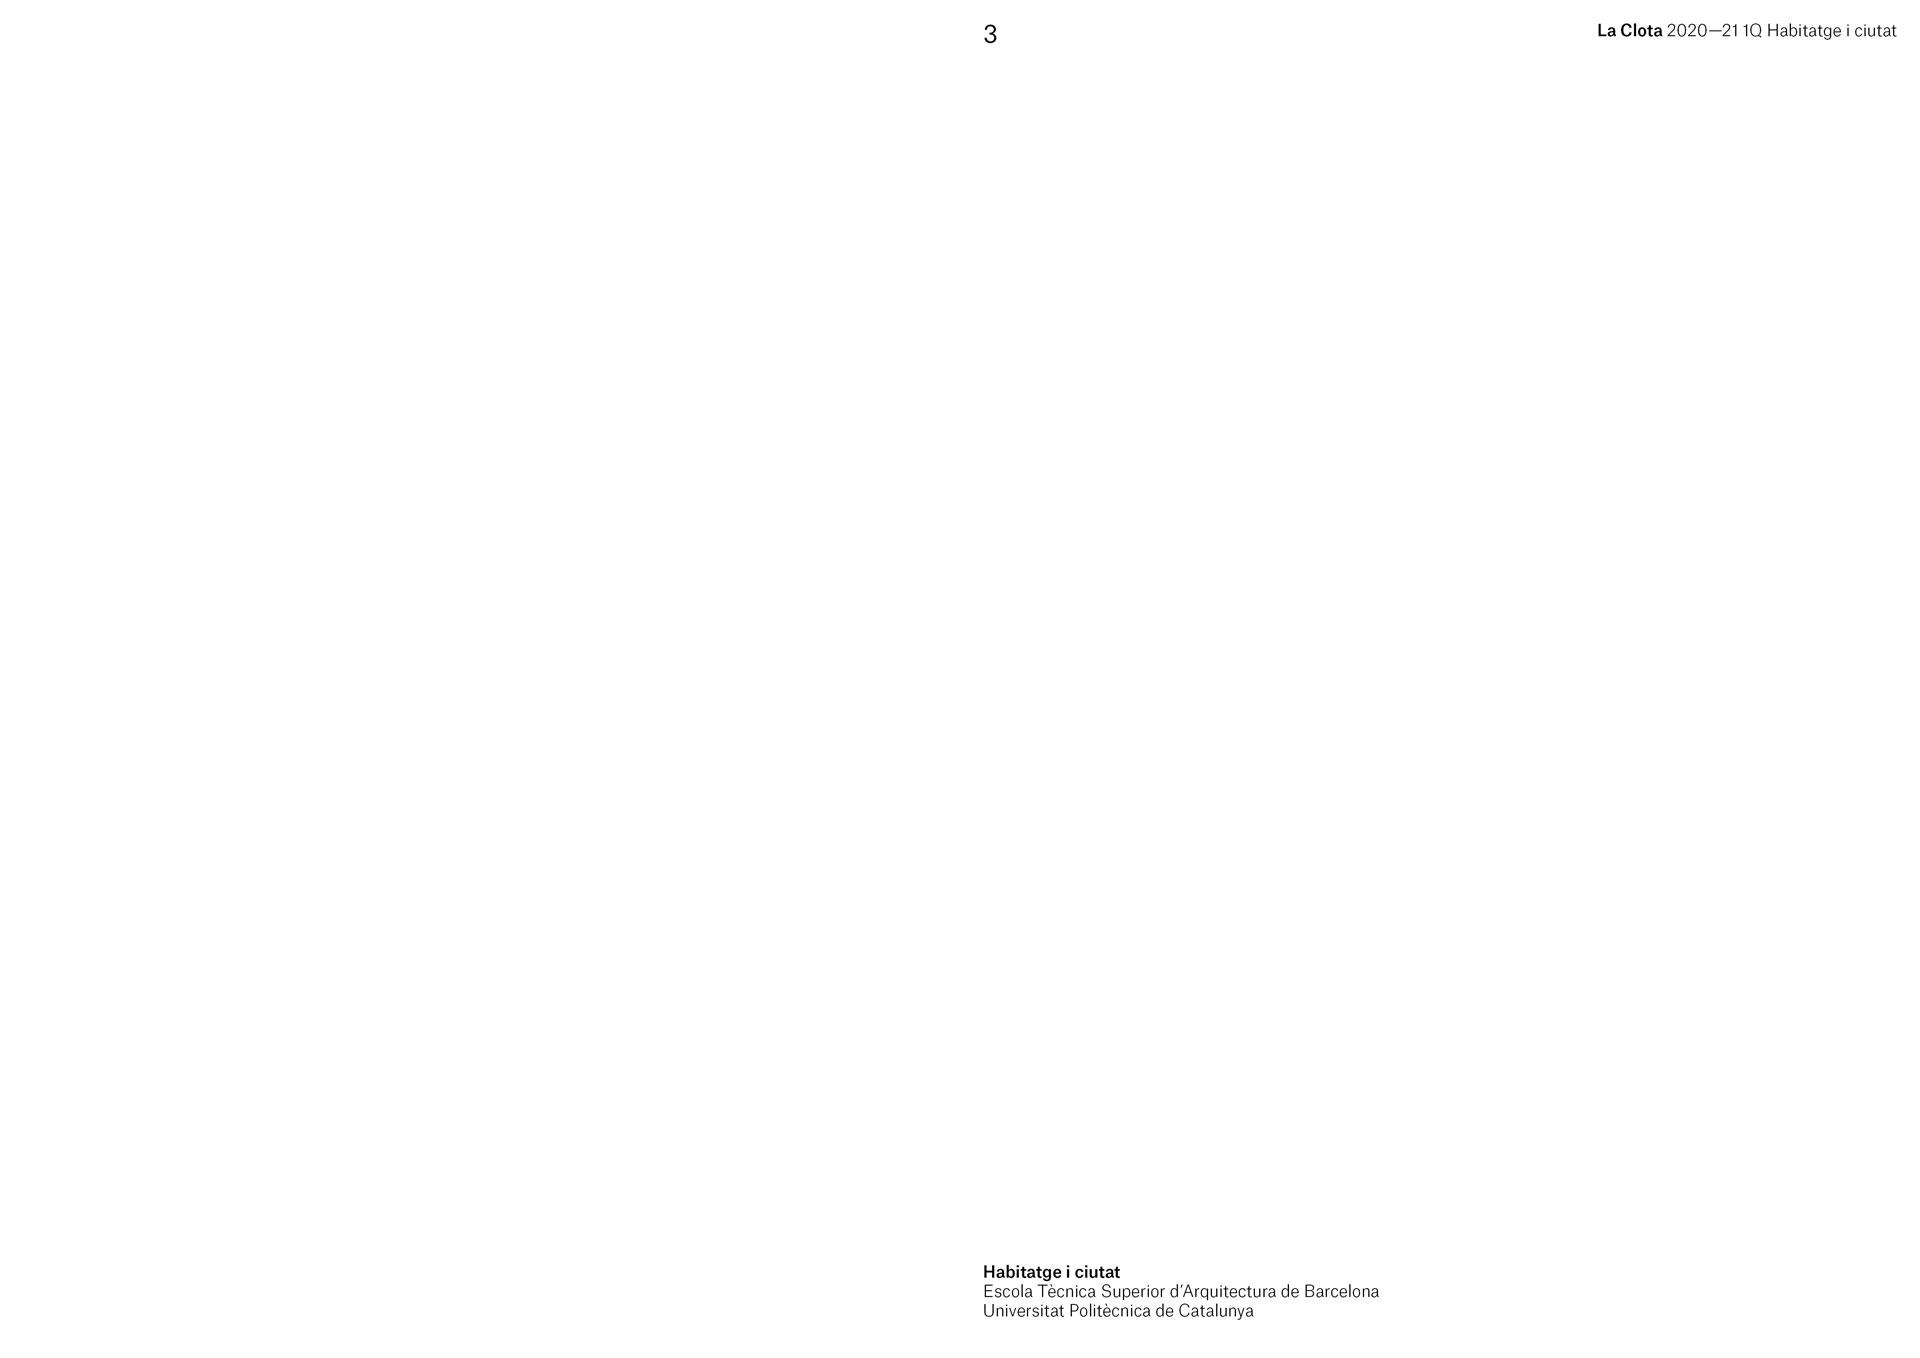 HiC-dossier-2021_1Q2